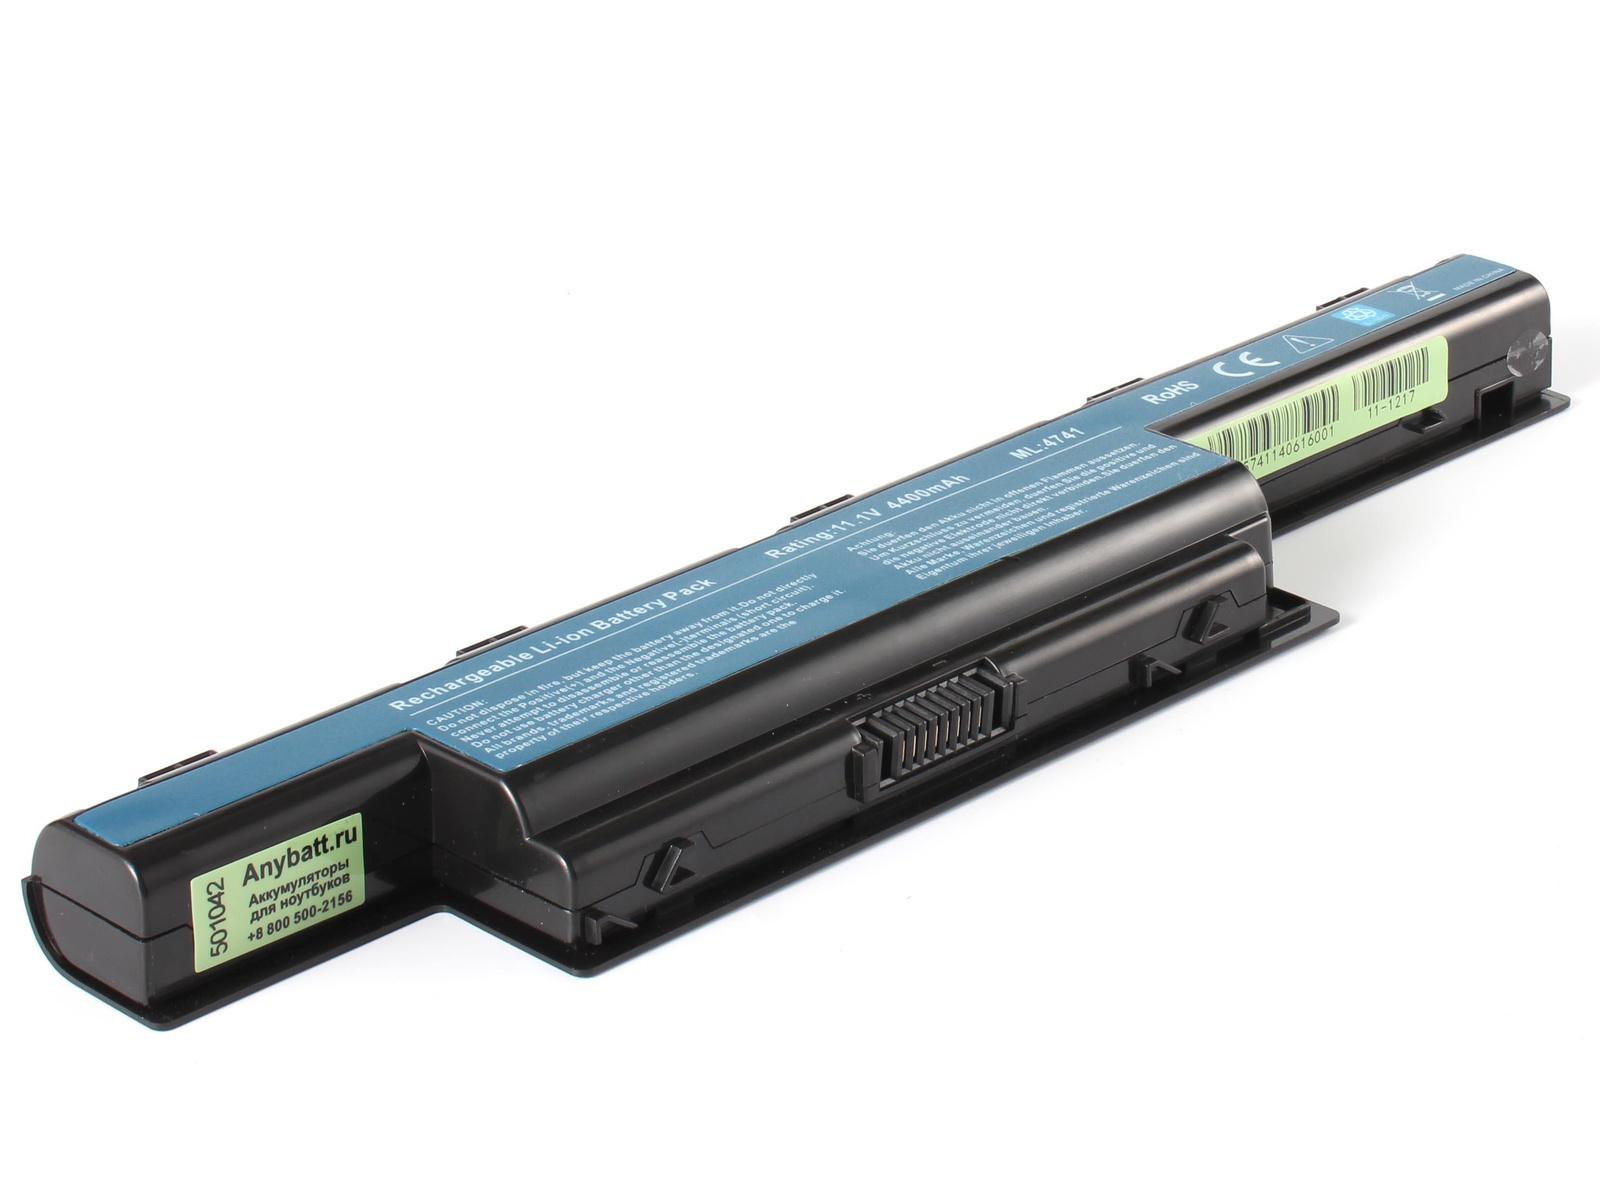 Аккумулятор для ноутбука AnyBatt для Acer Aspire 5551G-P323G25Mi, Aspire 5551-P323G25Misk, Aspire 5560G-6346G75Mnbb, Aspire 5733Z-P624G50Mikk, Aspire 5736G, Aspire 5741G-433G25Misk, Aspire 5742G-464G50Mikk, Aspire 5742G-484G50Mnrr free shipping for acer aspire 5551 5251 5741z 5741zg 5741 5741g 5742g keyboard pamrest touchpad bottom case cover